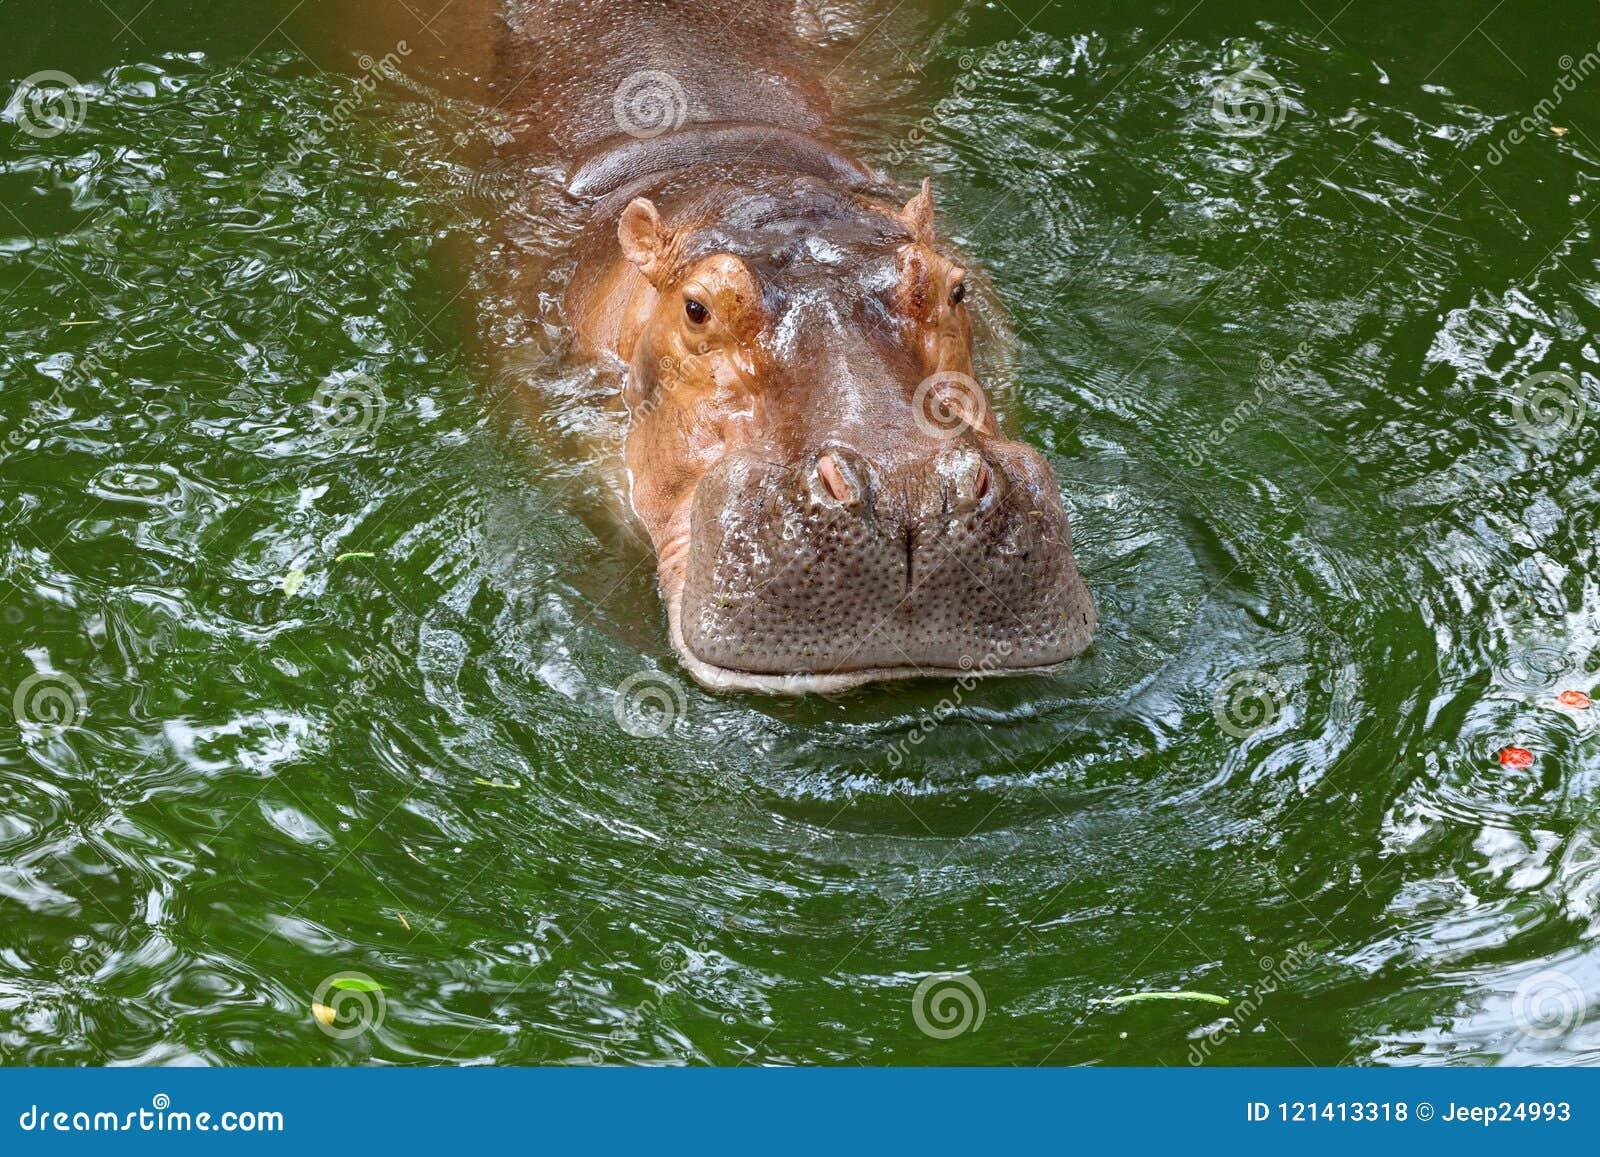 Hippo / The hippopotamus, or hippo, mostly herbivorous mammal in